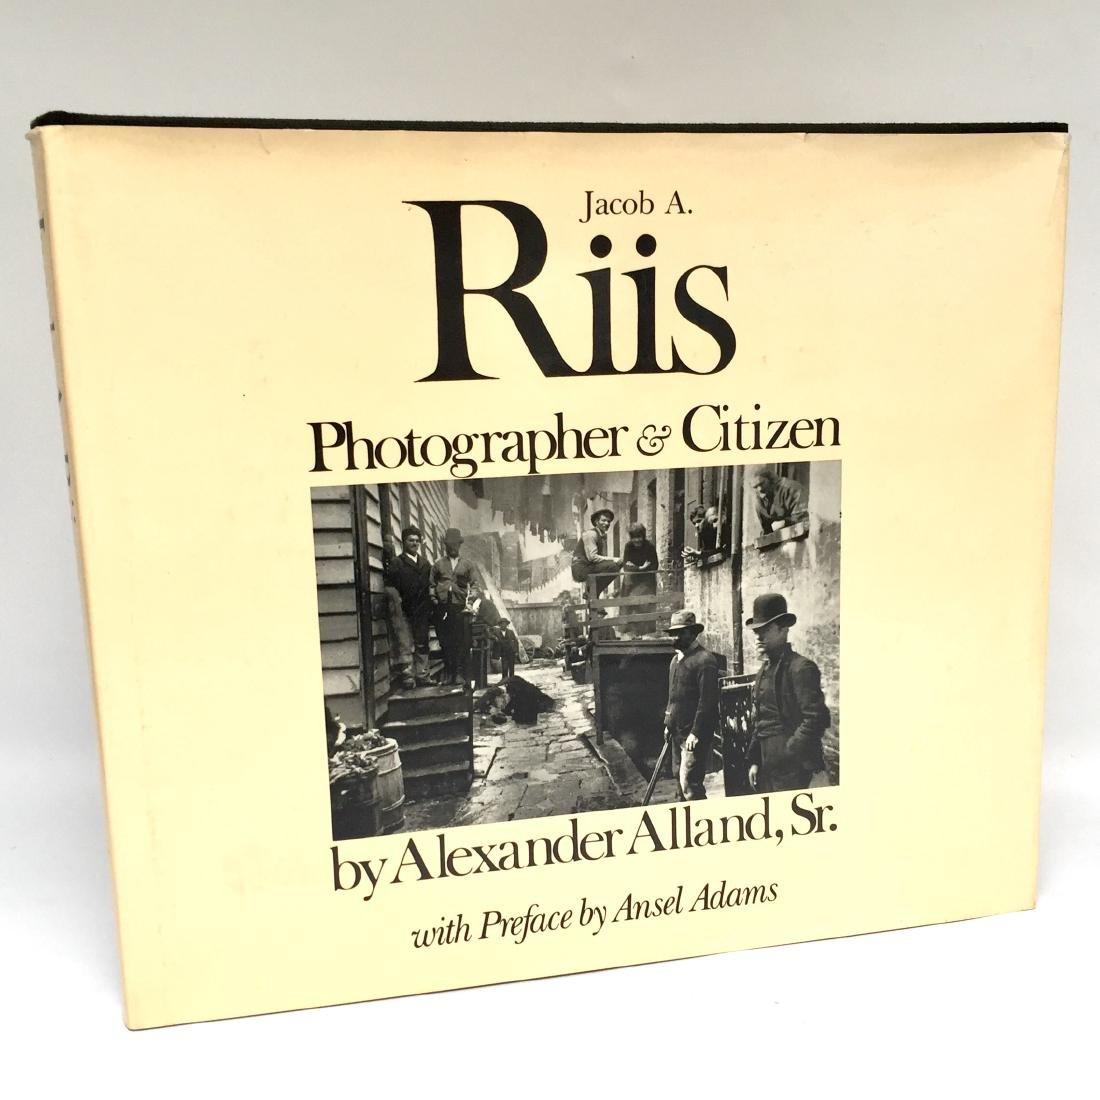 Jacob A. Riis Photographer & Citizen First Edition